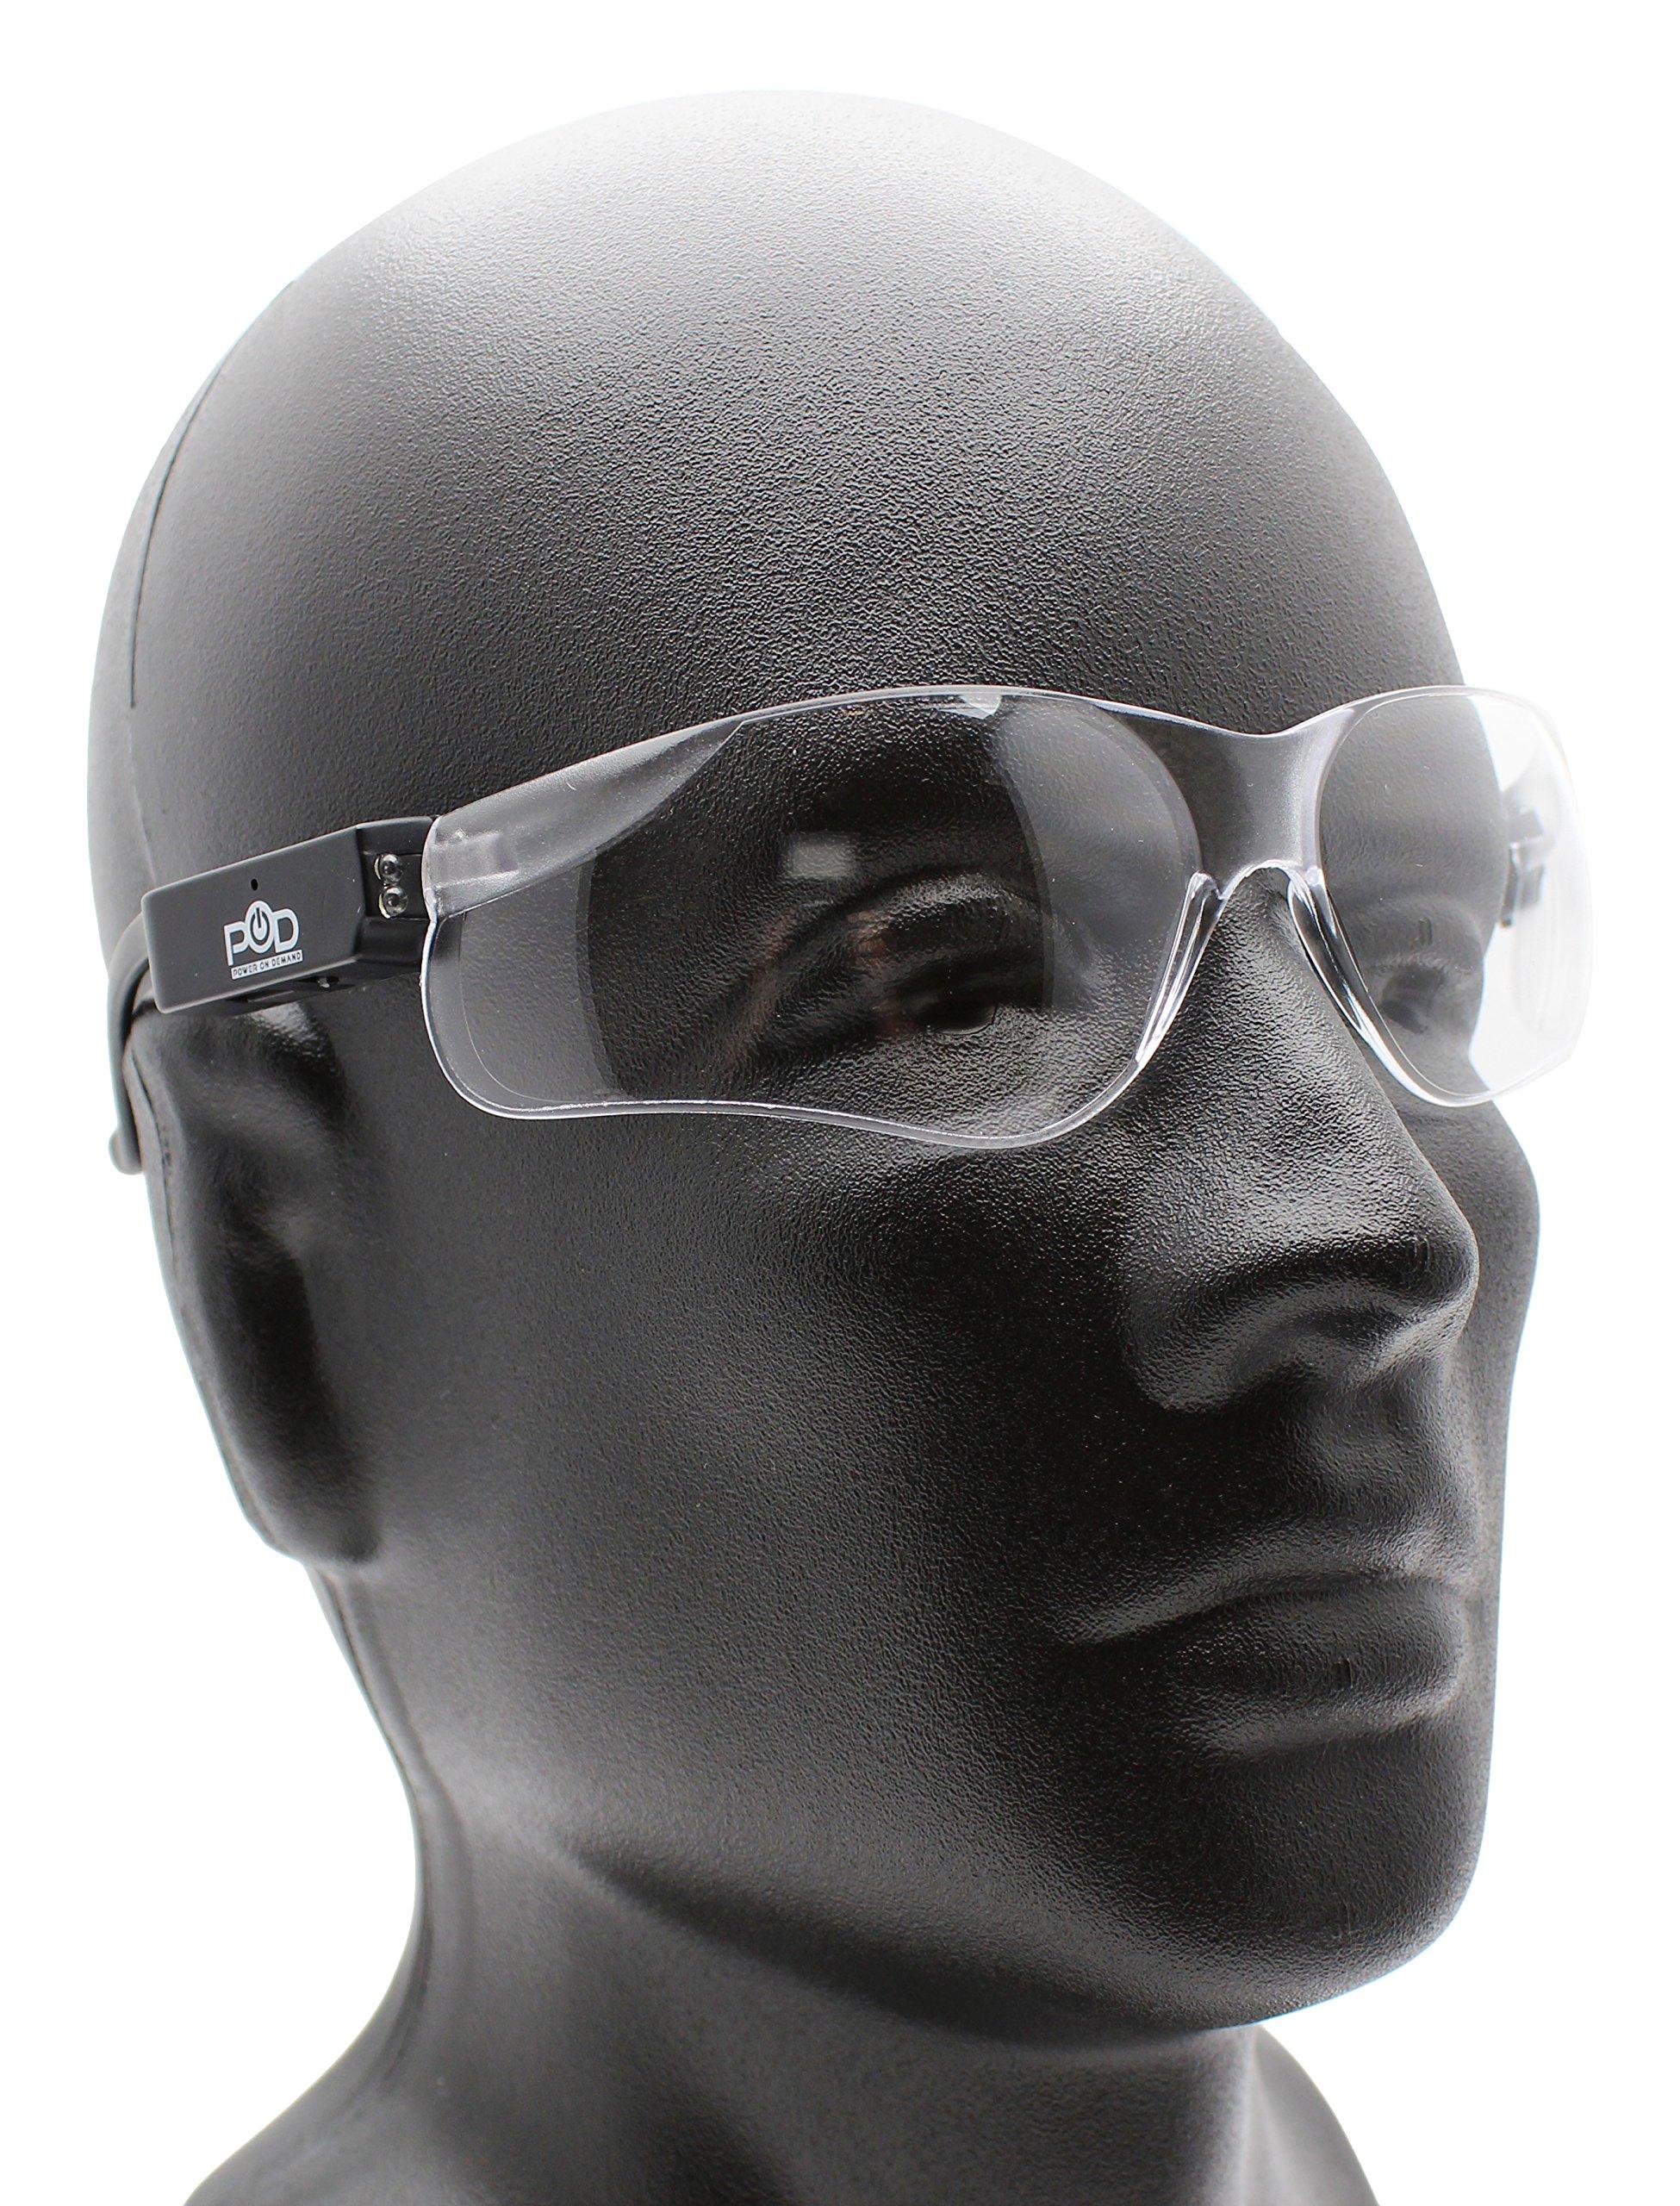 Power on Demand Lumen Eyes: LED Safety Glasses